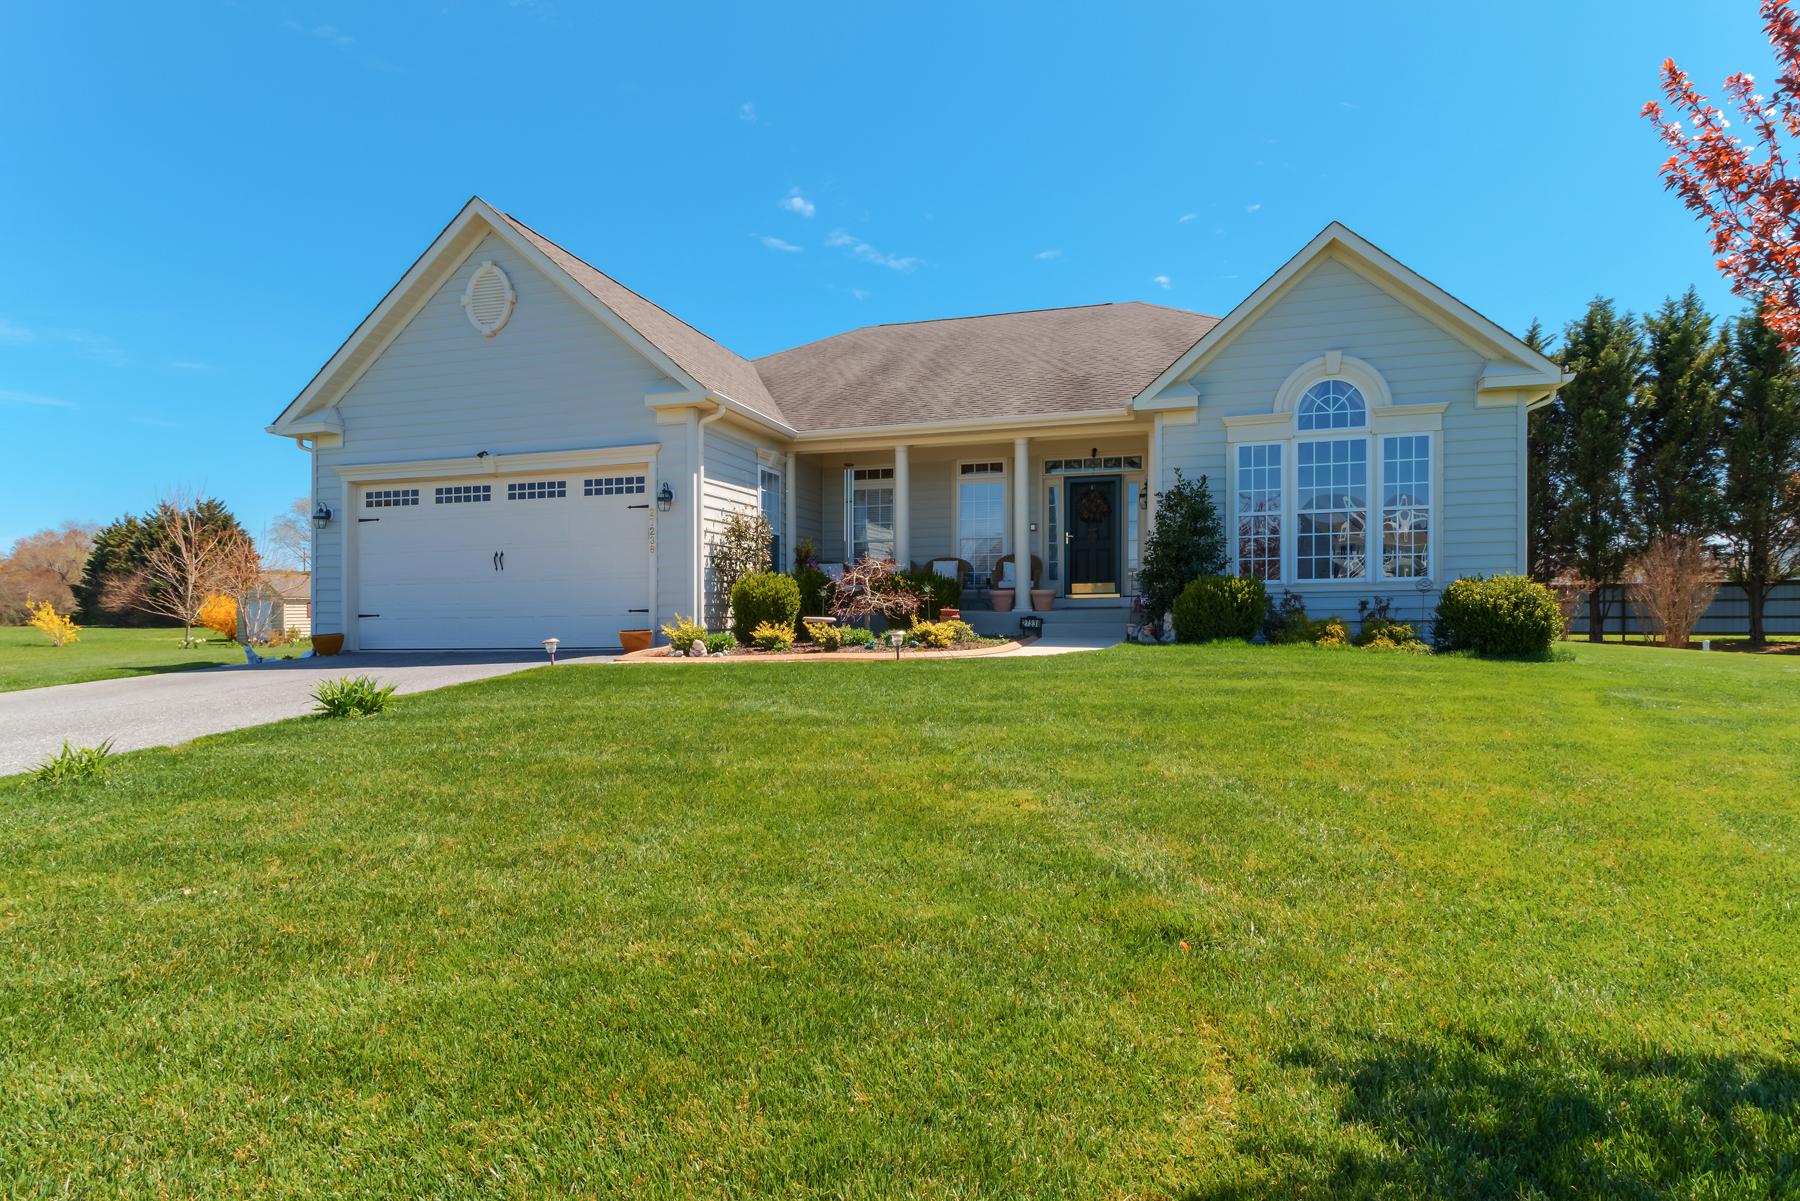 Property For Sale at 27238 Buckskin Trl, Harbeson, DE 19951